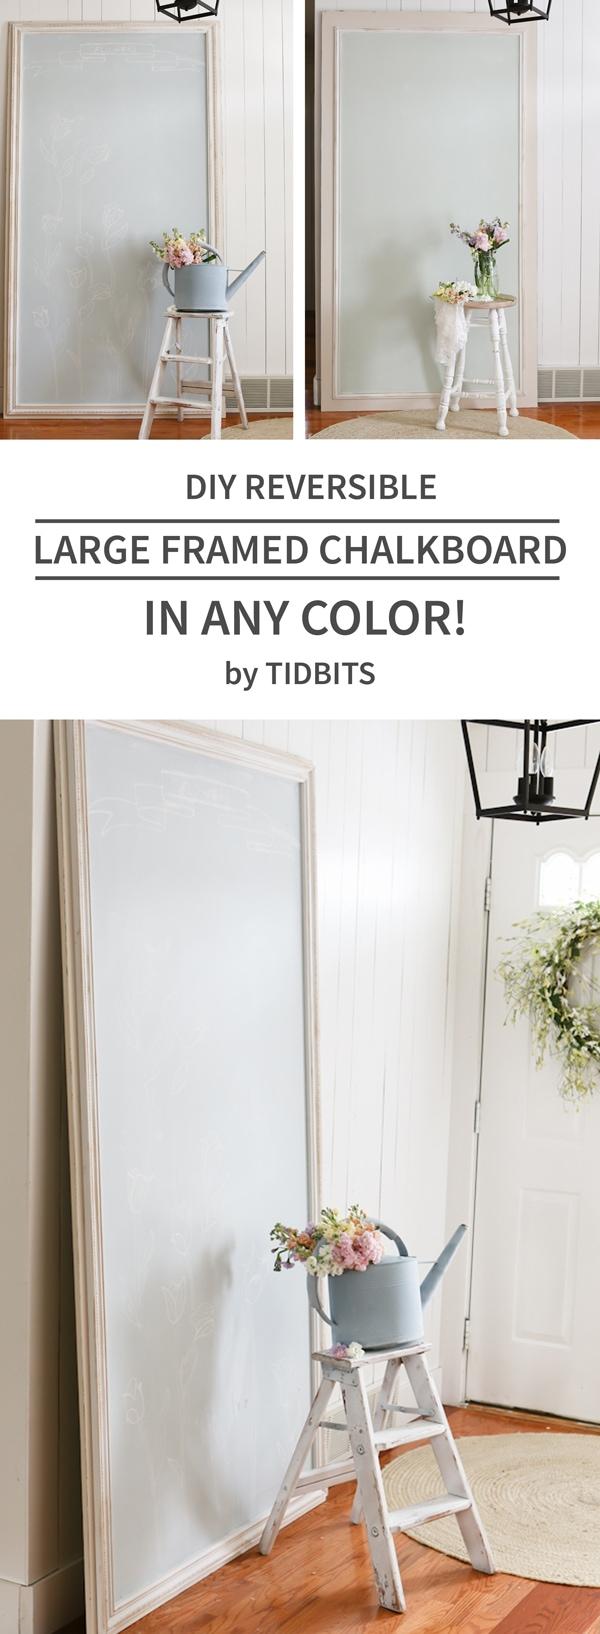 DIY Large Framed Chalkboard - IN ANY COLOR! - Tidbits